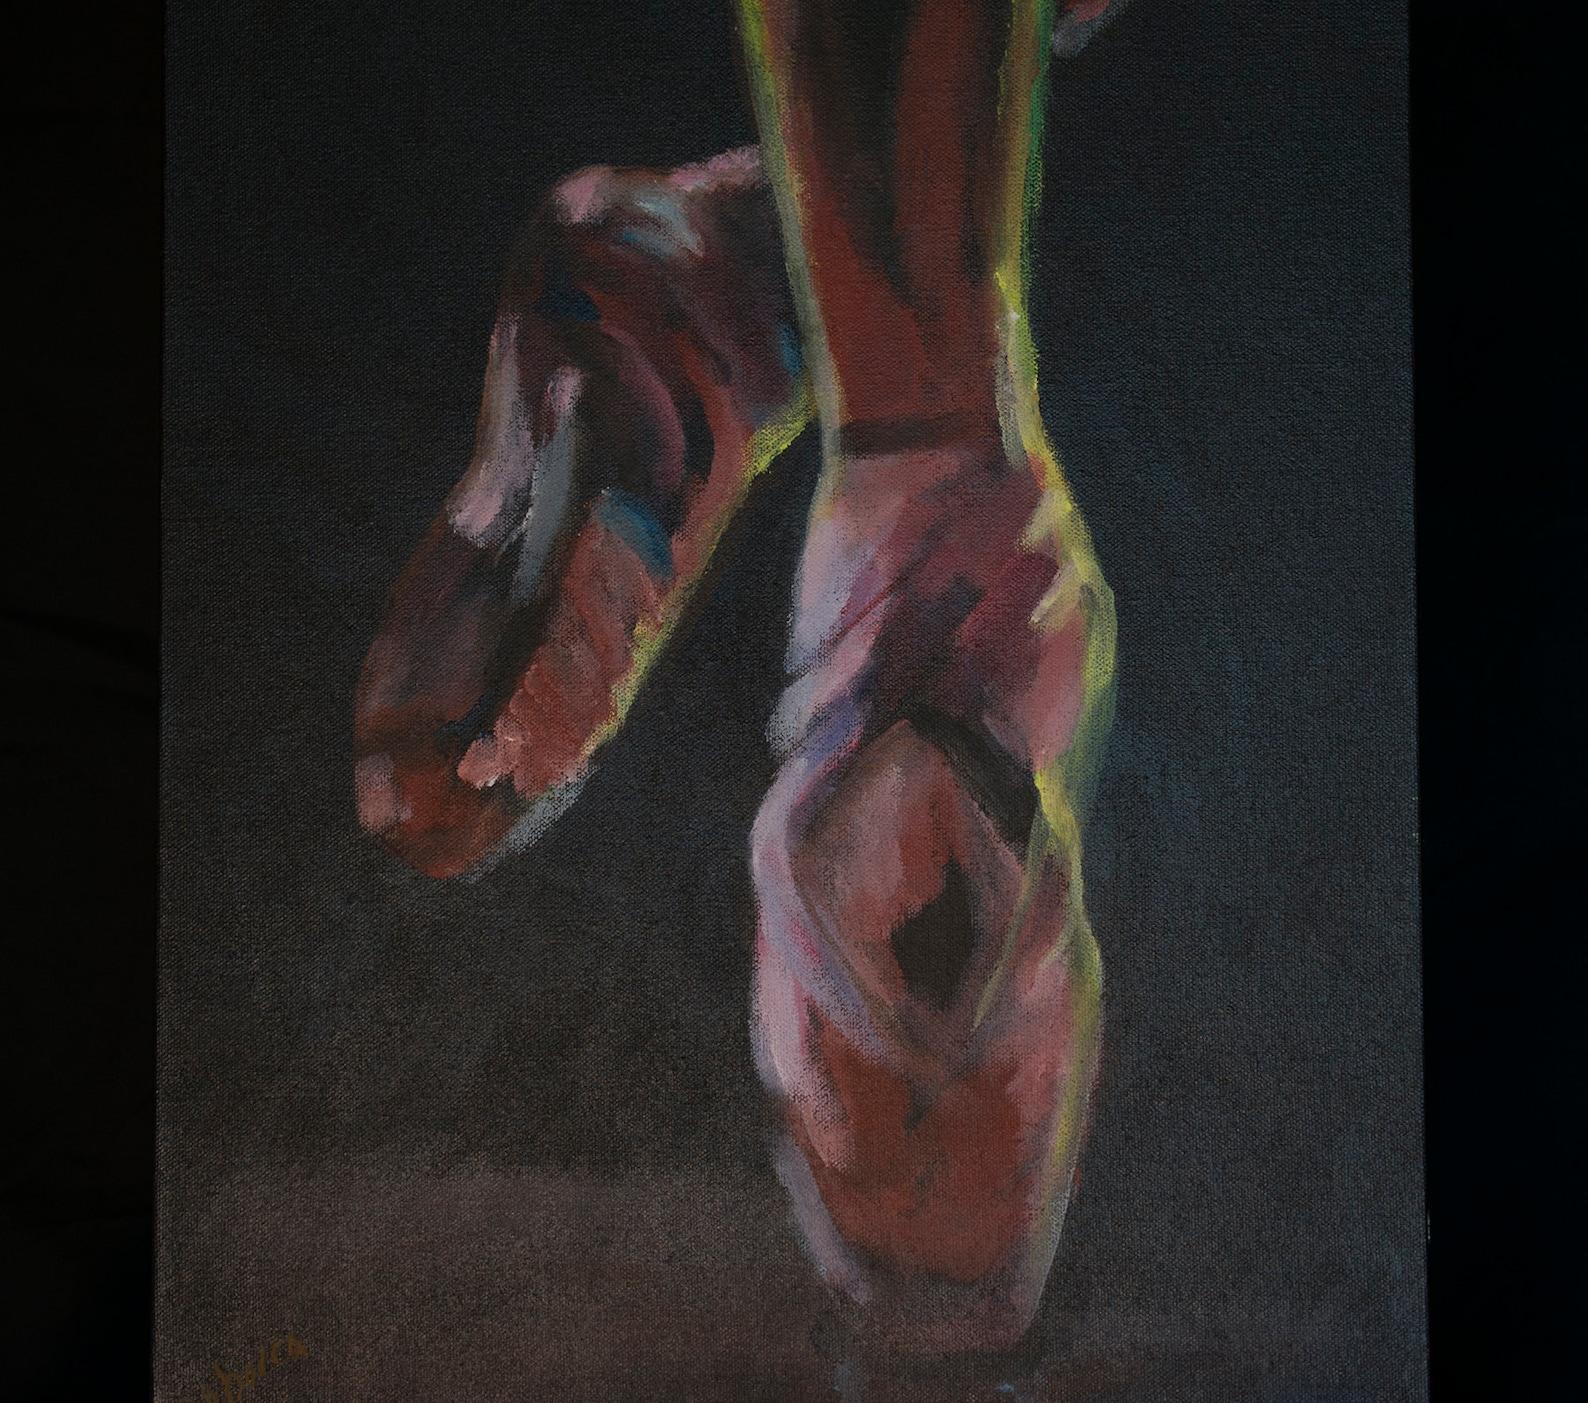 ballet shoes, ballet, ballerina, dancing, dancer, ballet slippers, dance, ballet painting, tip toe, acrylic painting